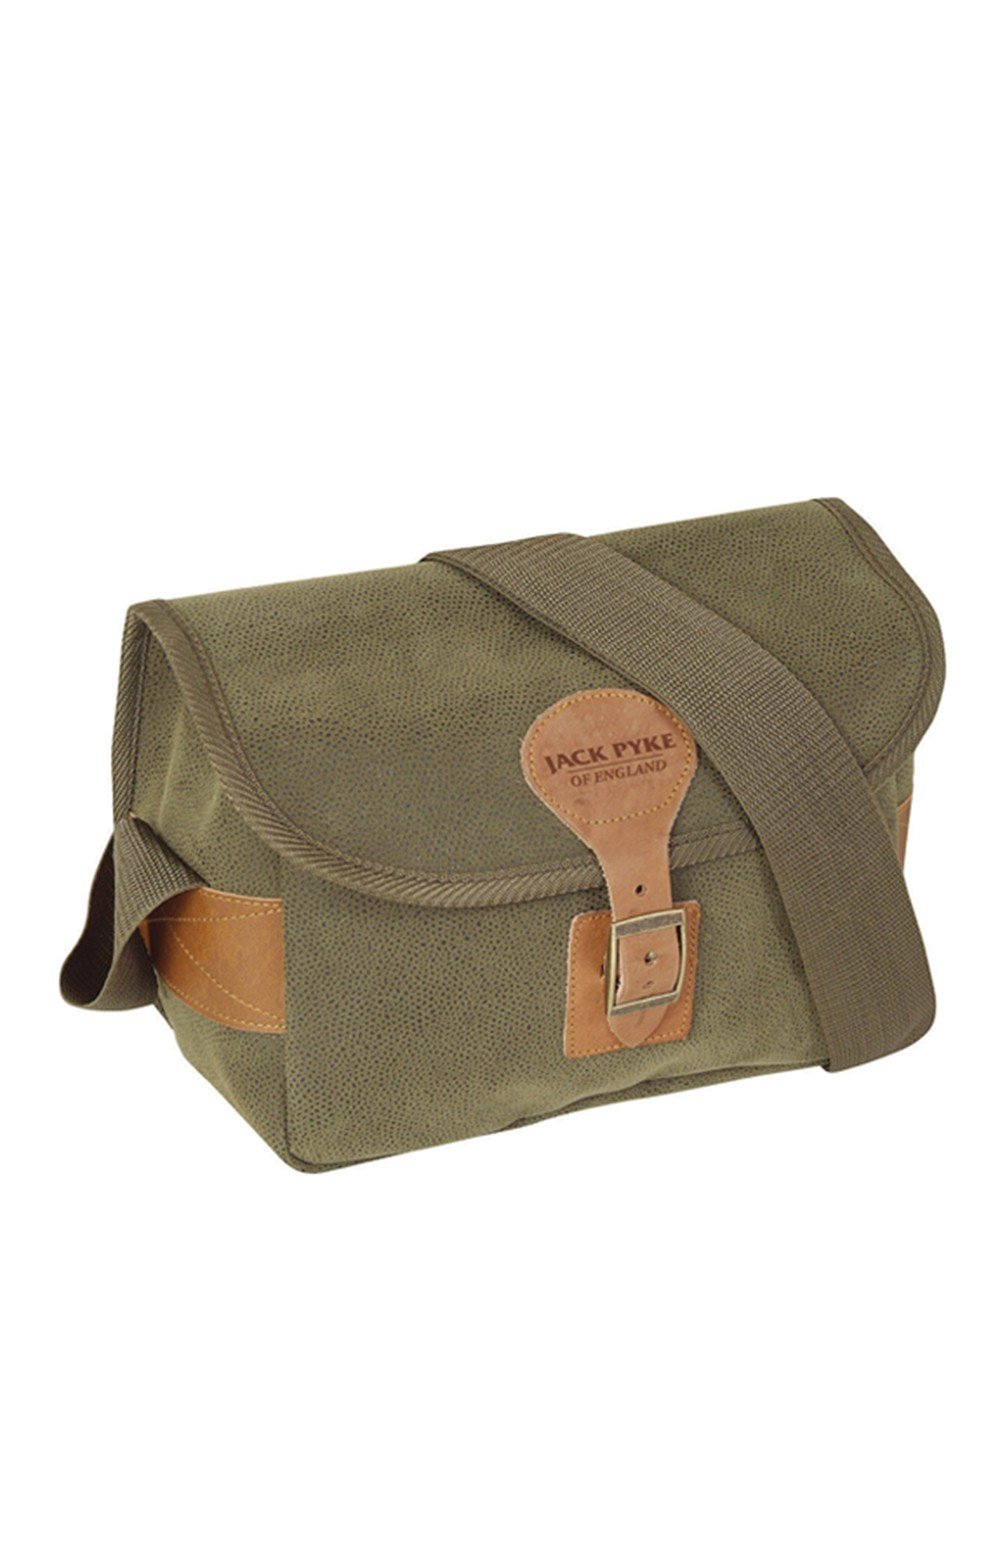 Jack Pyke Doutex Cartridge Bag - House of Bruar